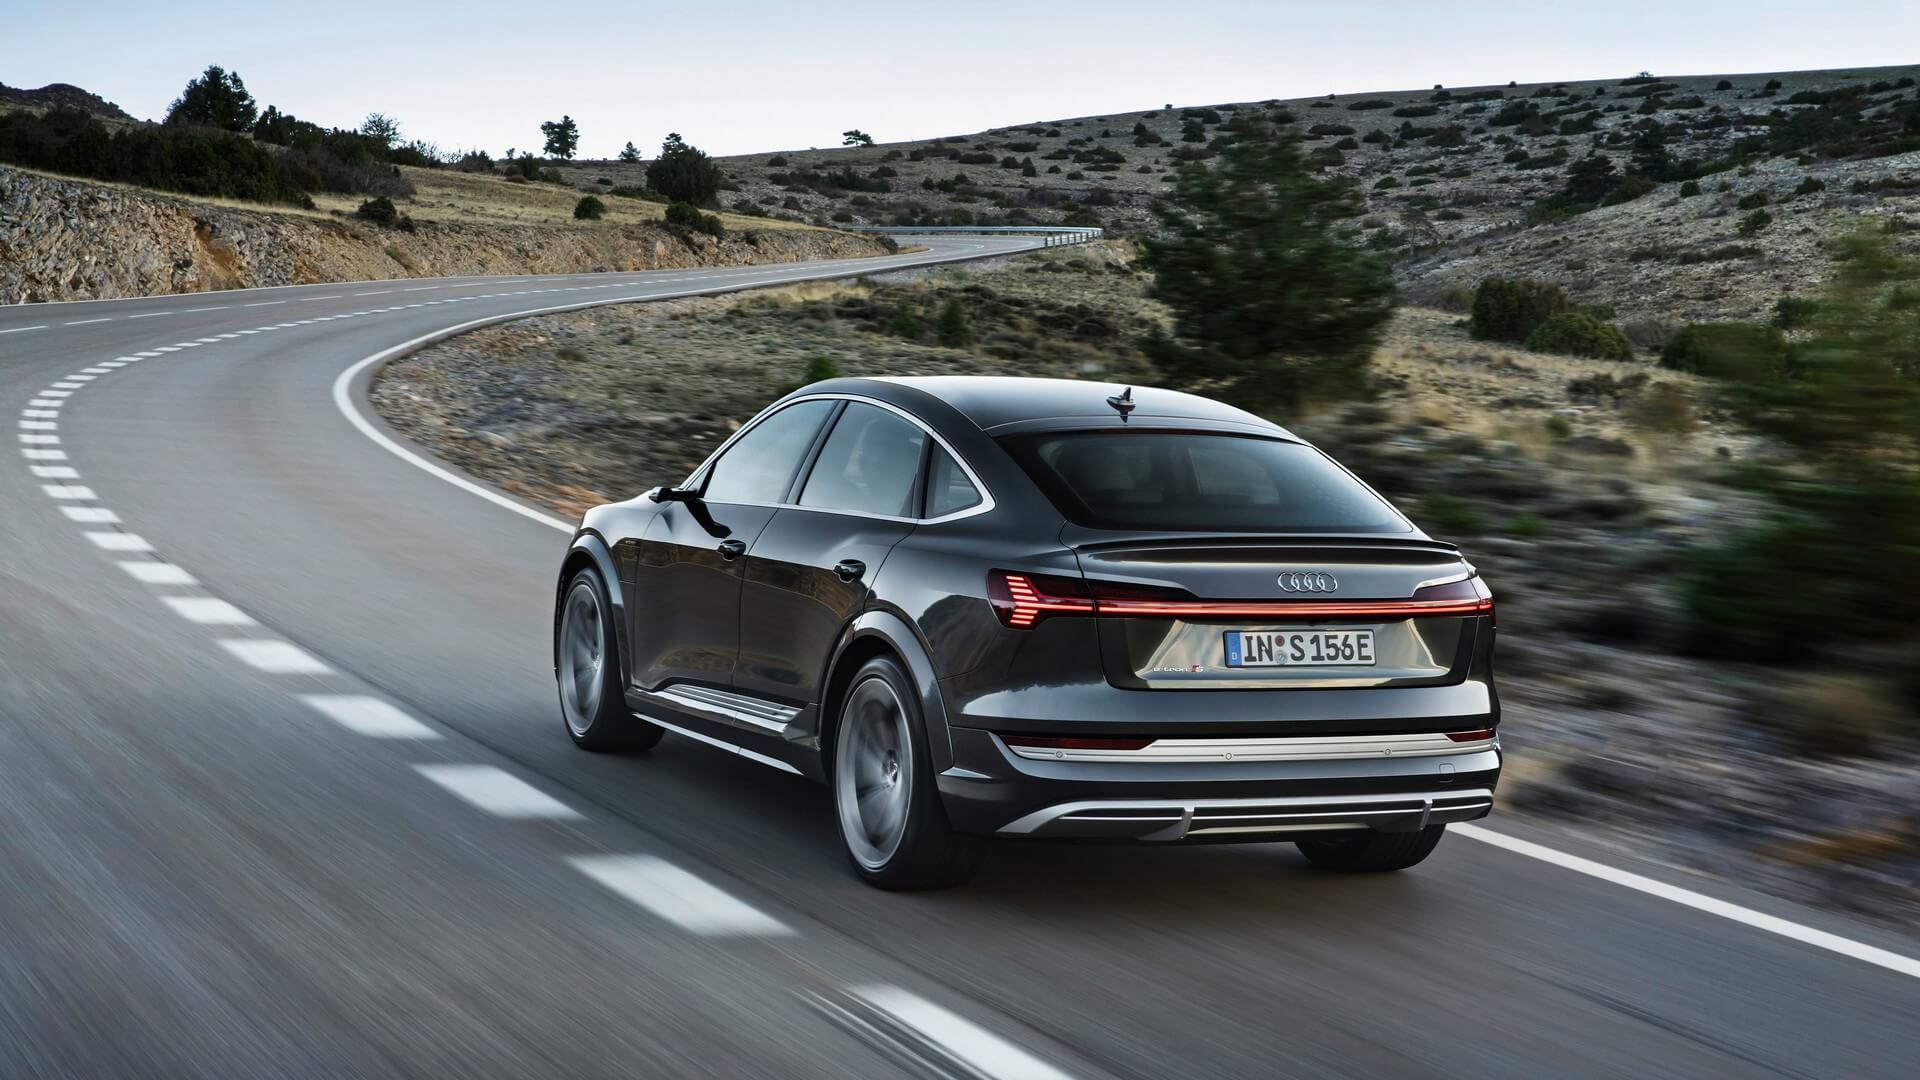 Audi-E-Tron-S-and-E-Tron-S-Sportback-2020-56